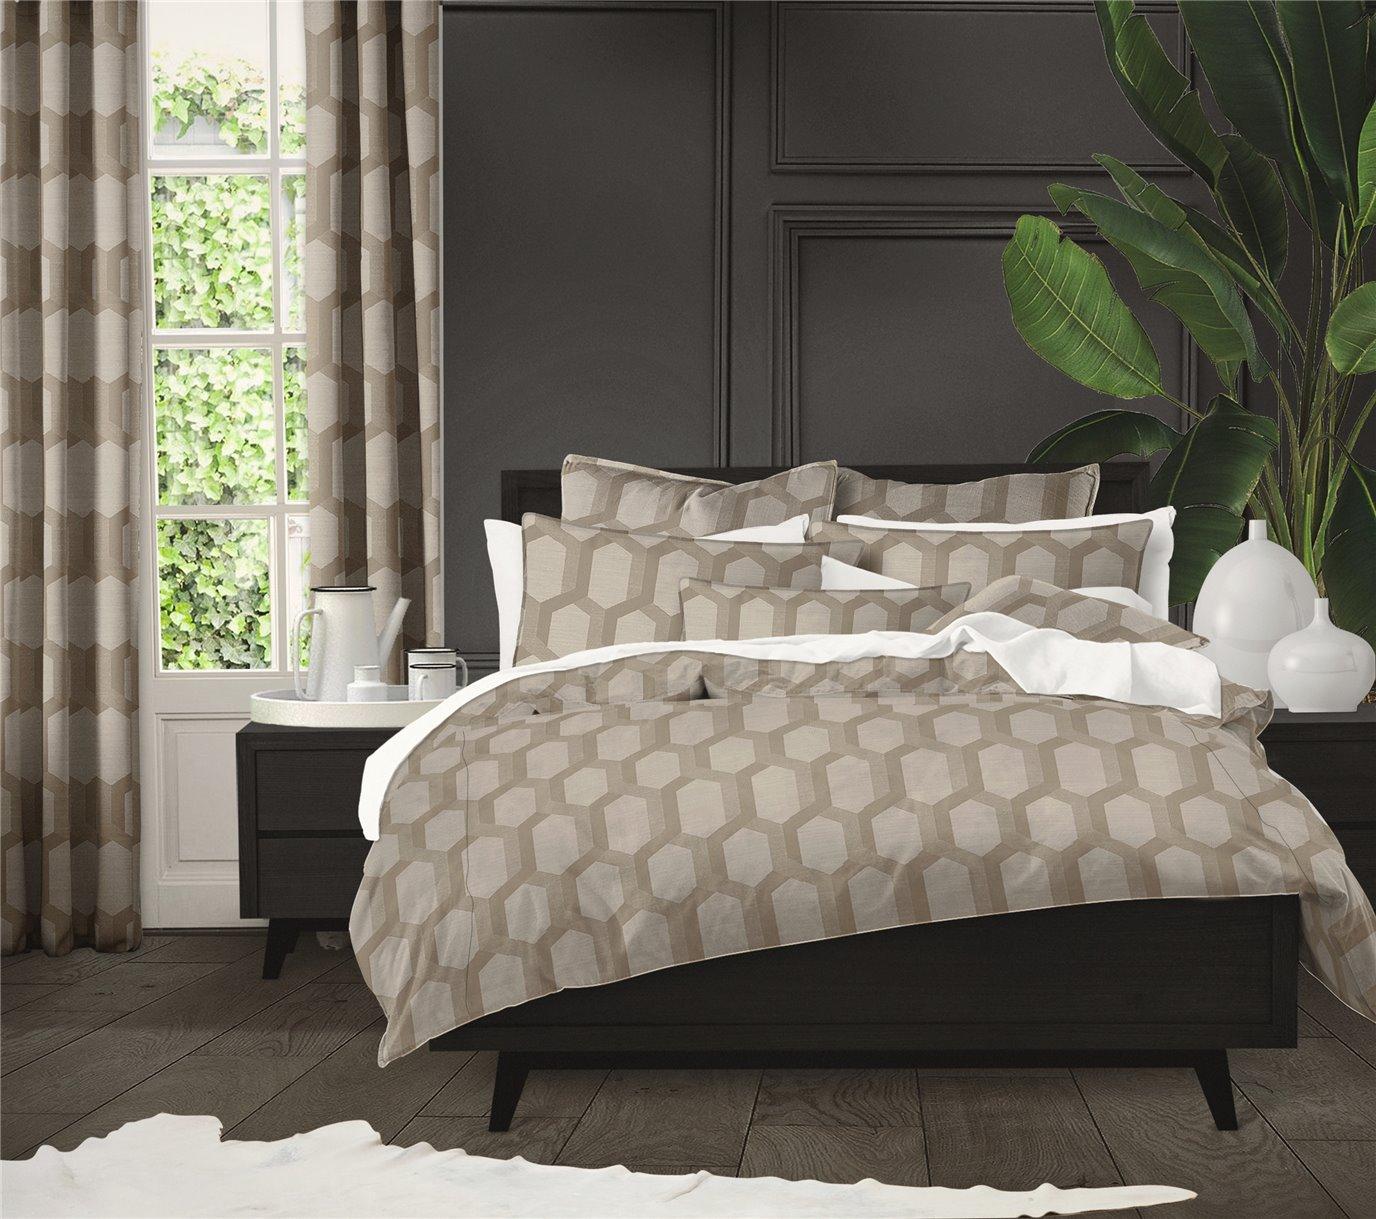 Maidstone Taupe Comforter Set - California King